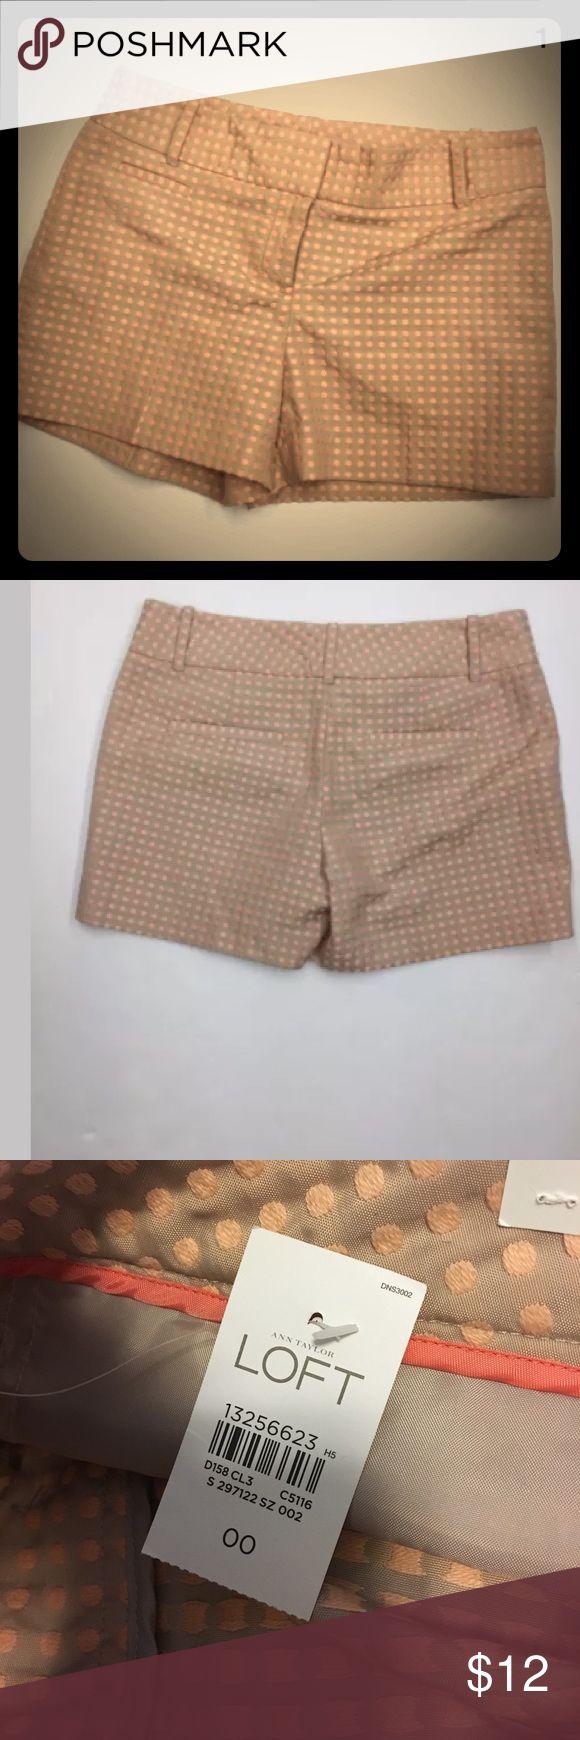 MAKE AN OFFER‼️ NEW Loft Polka Dot Shorts Size 00 Ann Taylor LOFT Beige Tan Peach Coral Polka Dot Flat Front Chino Shorts New with Tags  Sz 00 LOFT Shorts